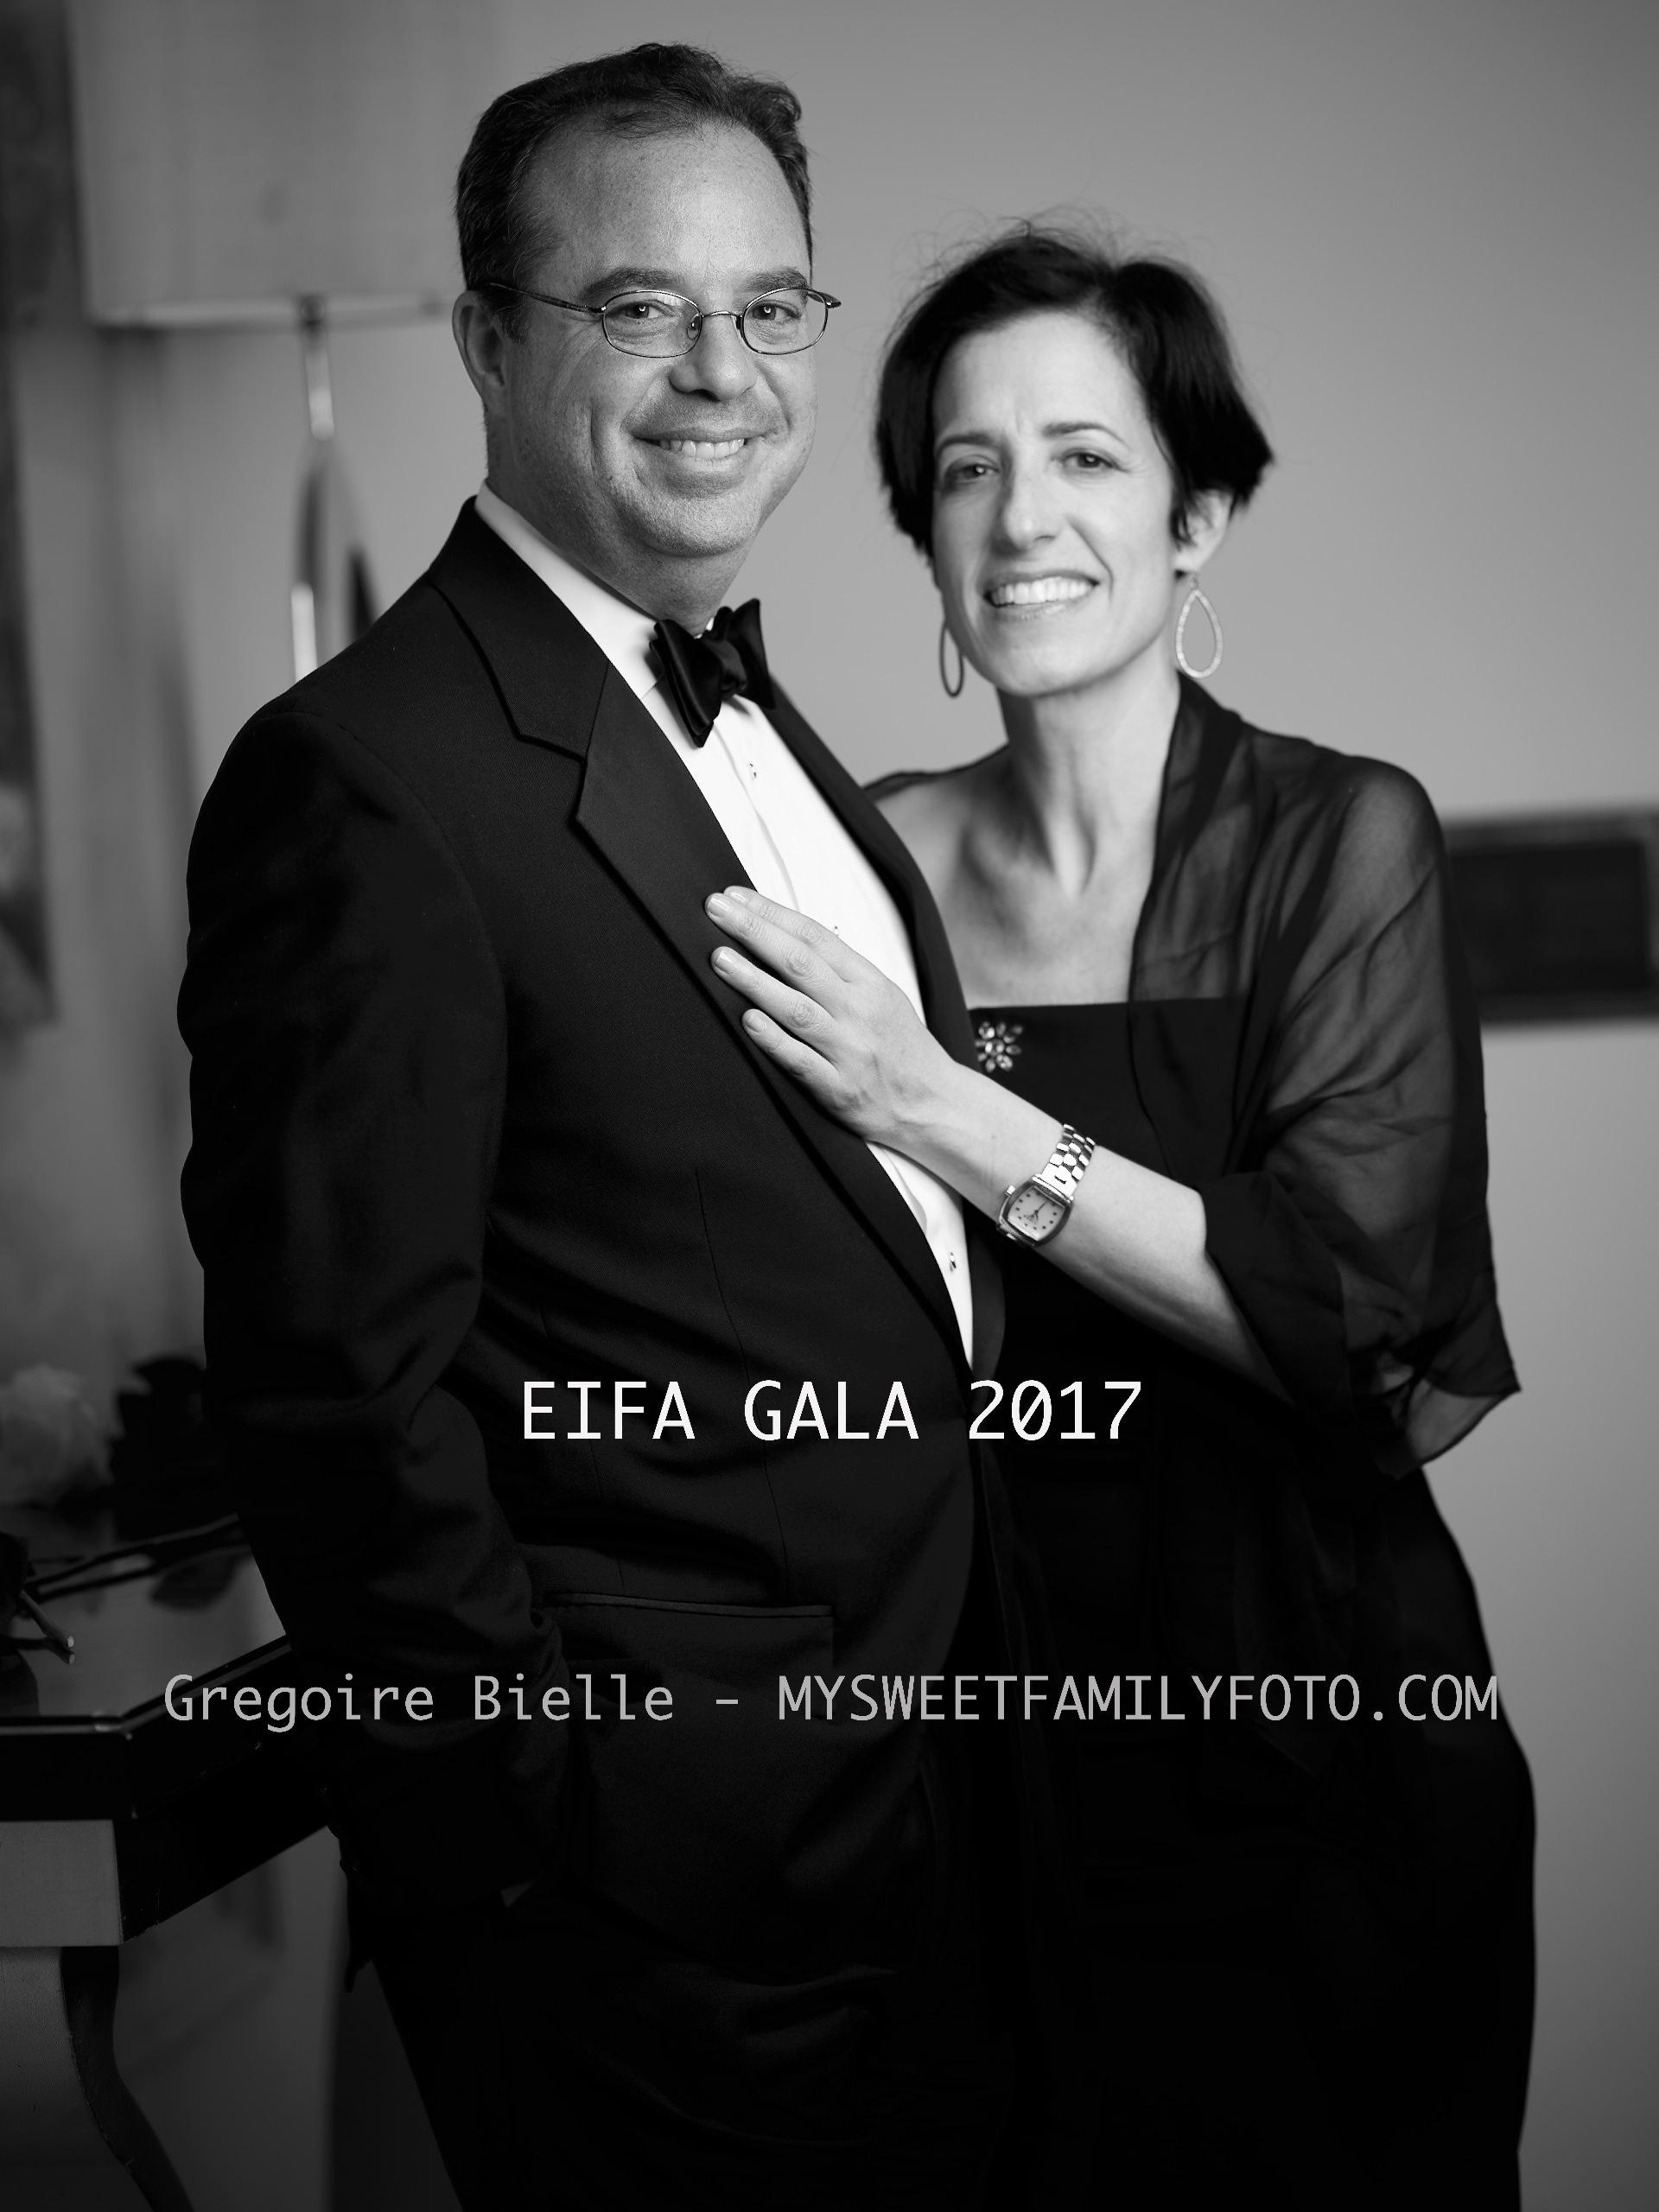 EIFA GALA 1260.jpg